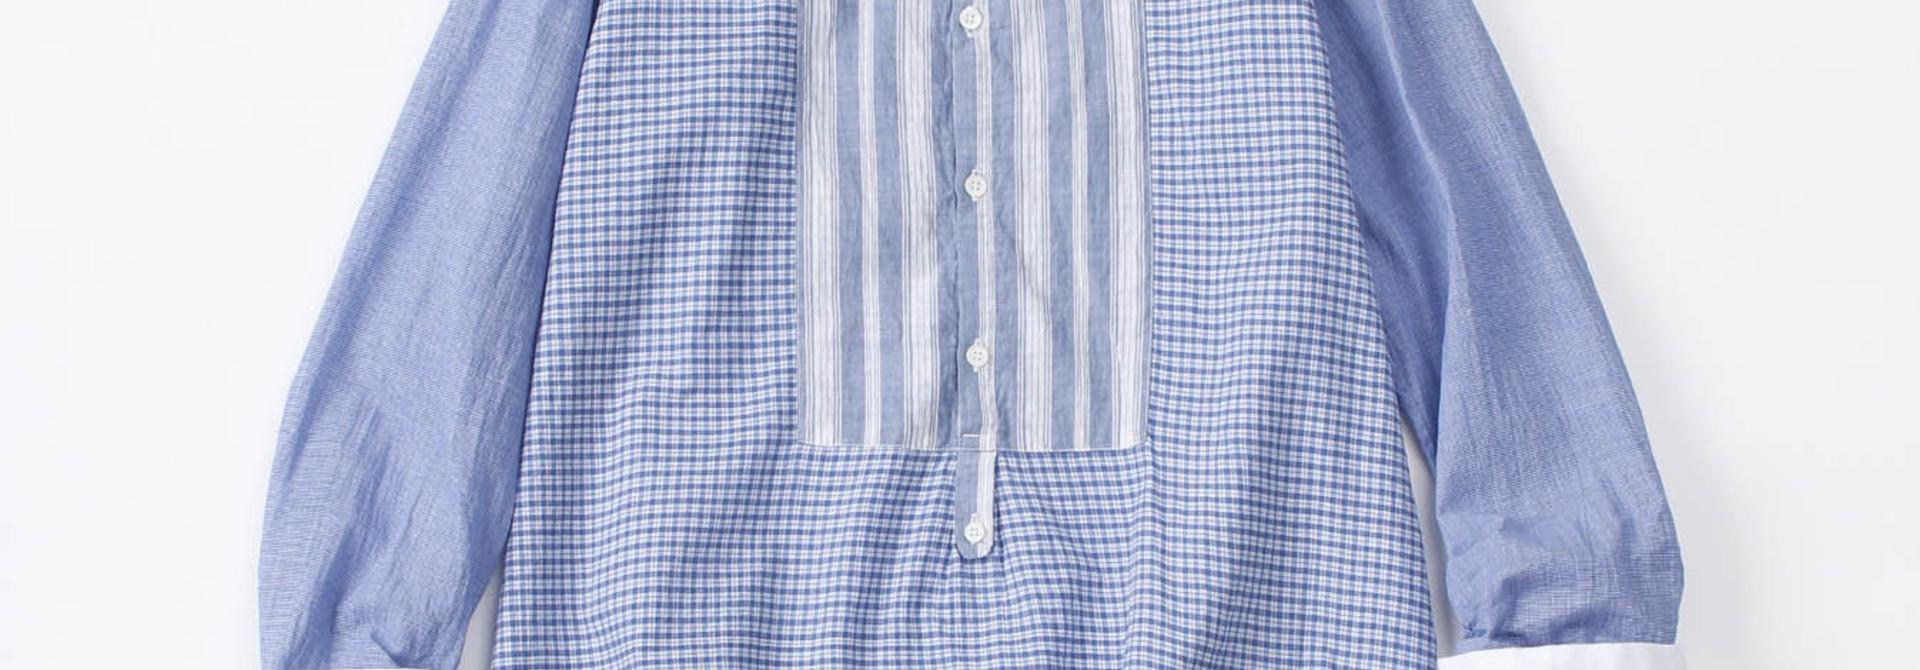 WH Mix Ai-kaze Khadi Pullover Shirt